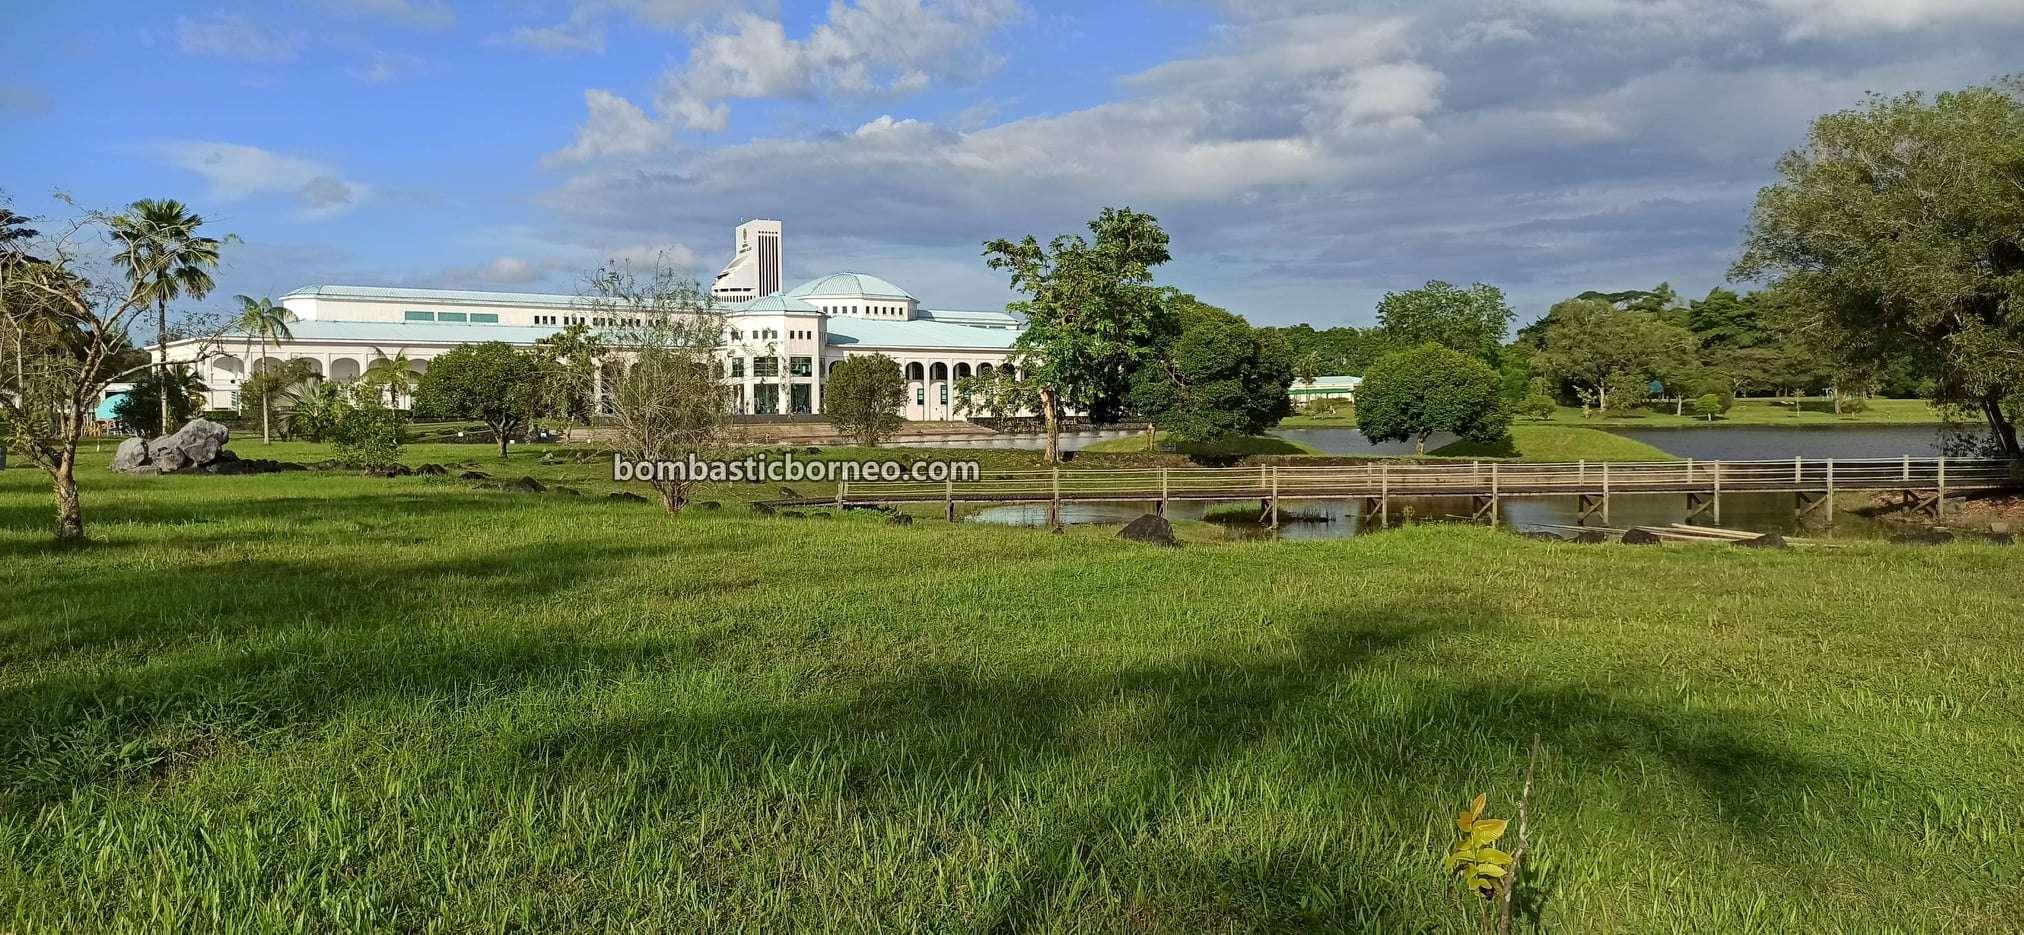 Pustaka Negeri Sarawak, Sarawak State Library, tempat senaman, jogging, walking, outdoor, exercise, garden park, Borneo, Kuching, Malaysia, nature, objek wisata, Tourism, travel local,